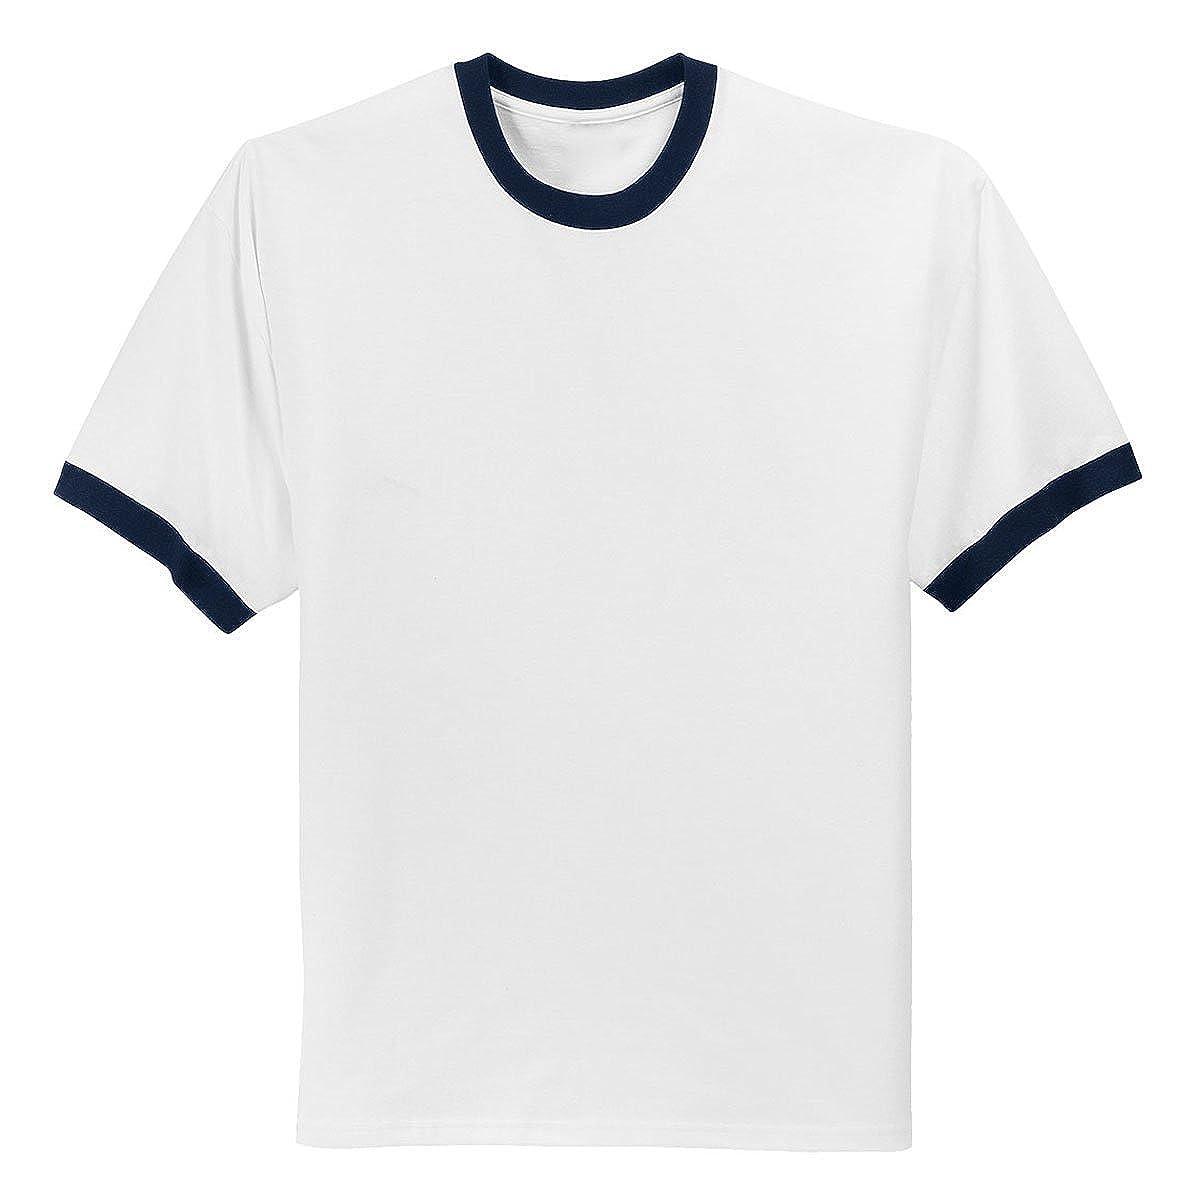 Port & Company - Ringer T-Shirt. | Amazon.com